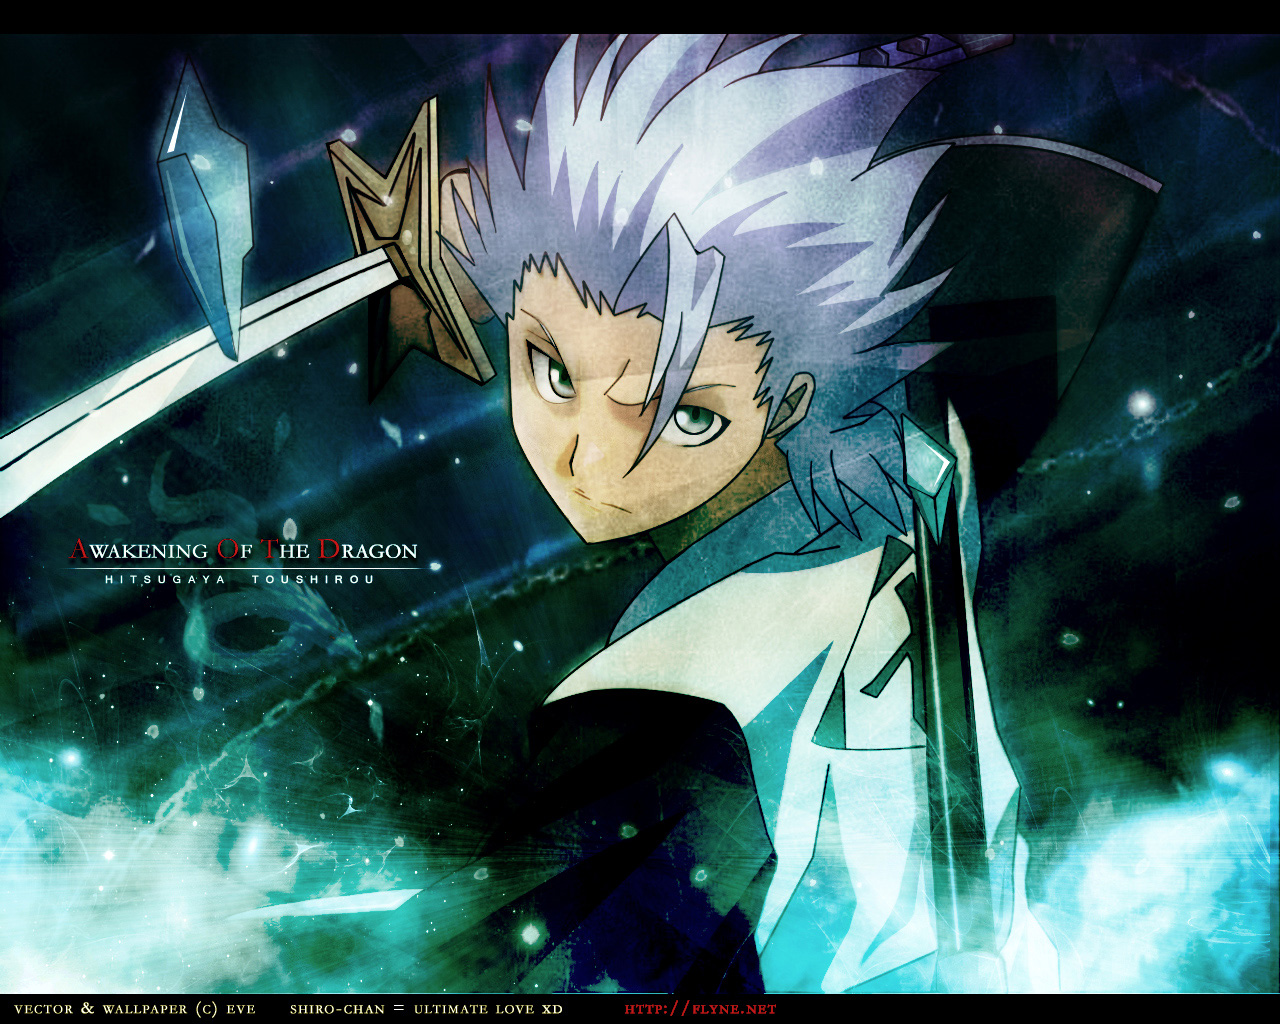 Anime Guys Wallpaper   Anime Guys Wallpaper 28180659 1280x1024